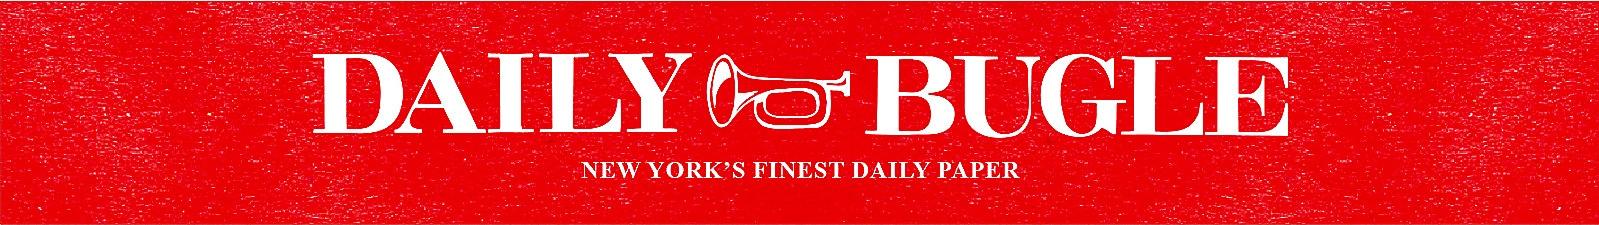 daily bugle - koptekst